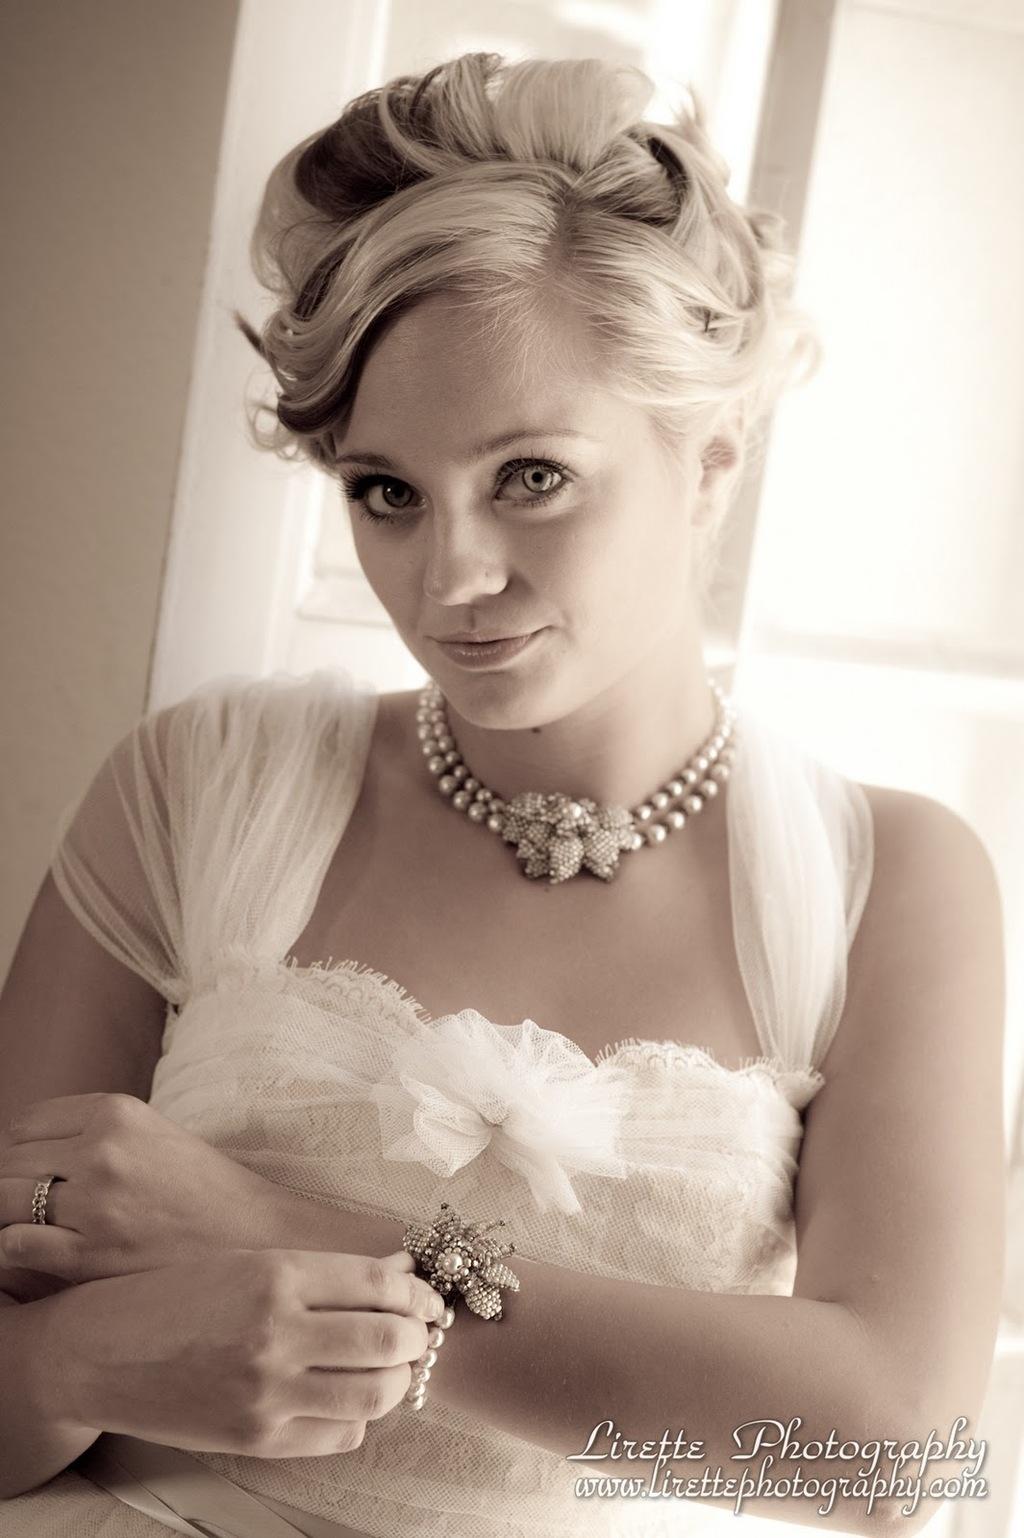 Bejeweled-bride-vintage-statement-bridal-jewelry-necklace-pearls-rhinestones-bracelet.full